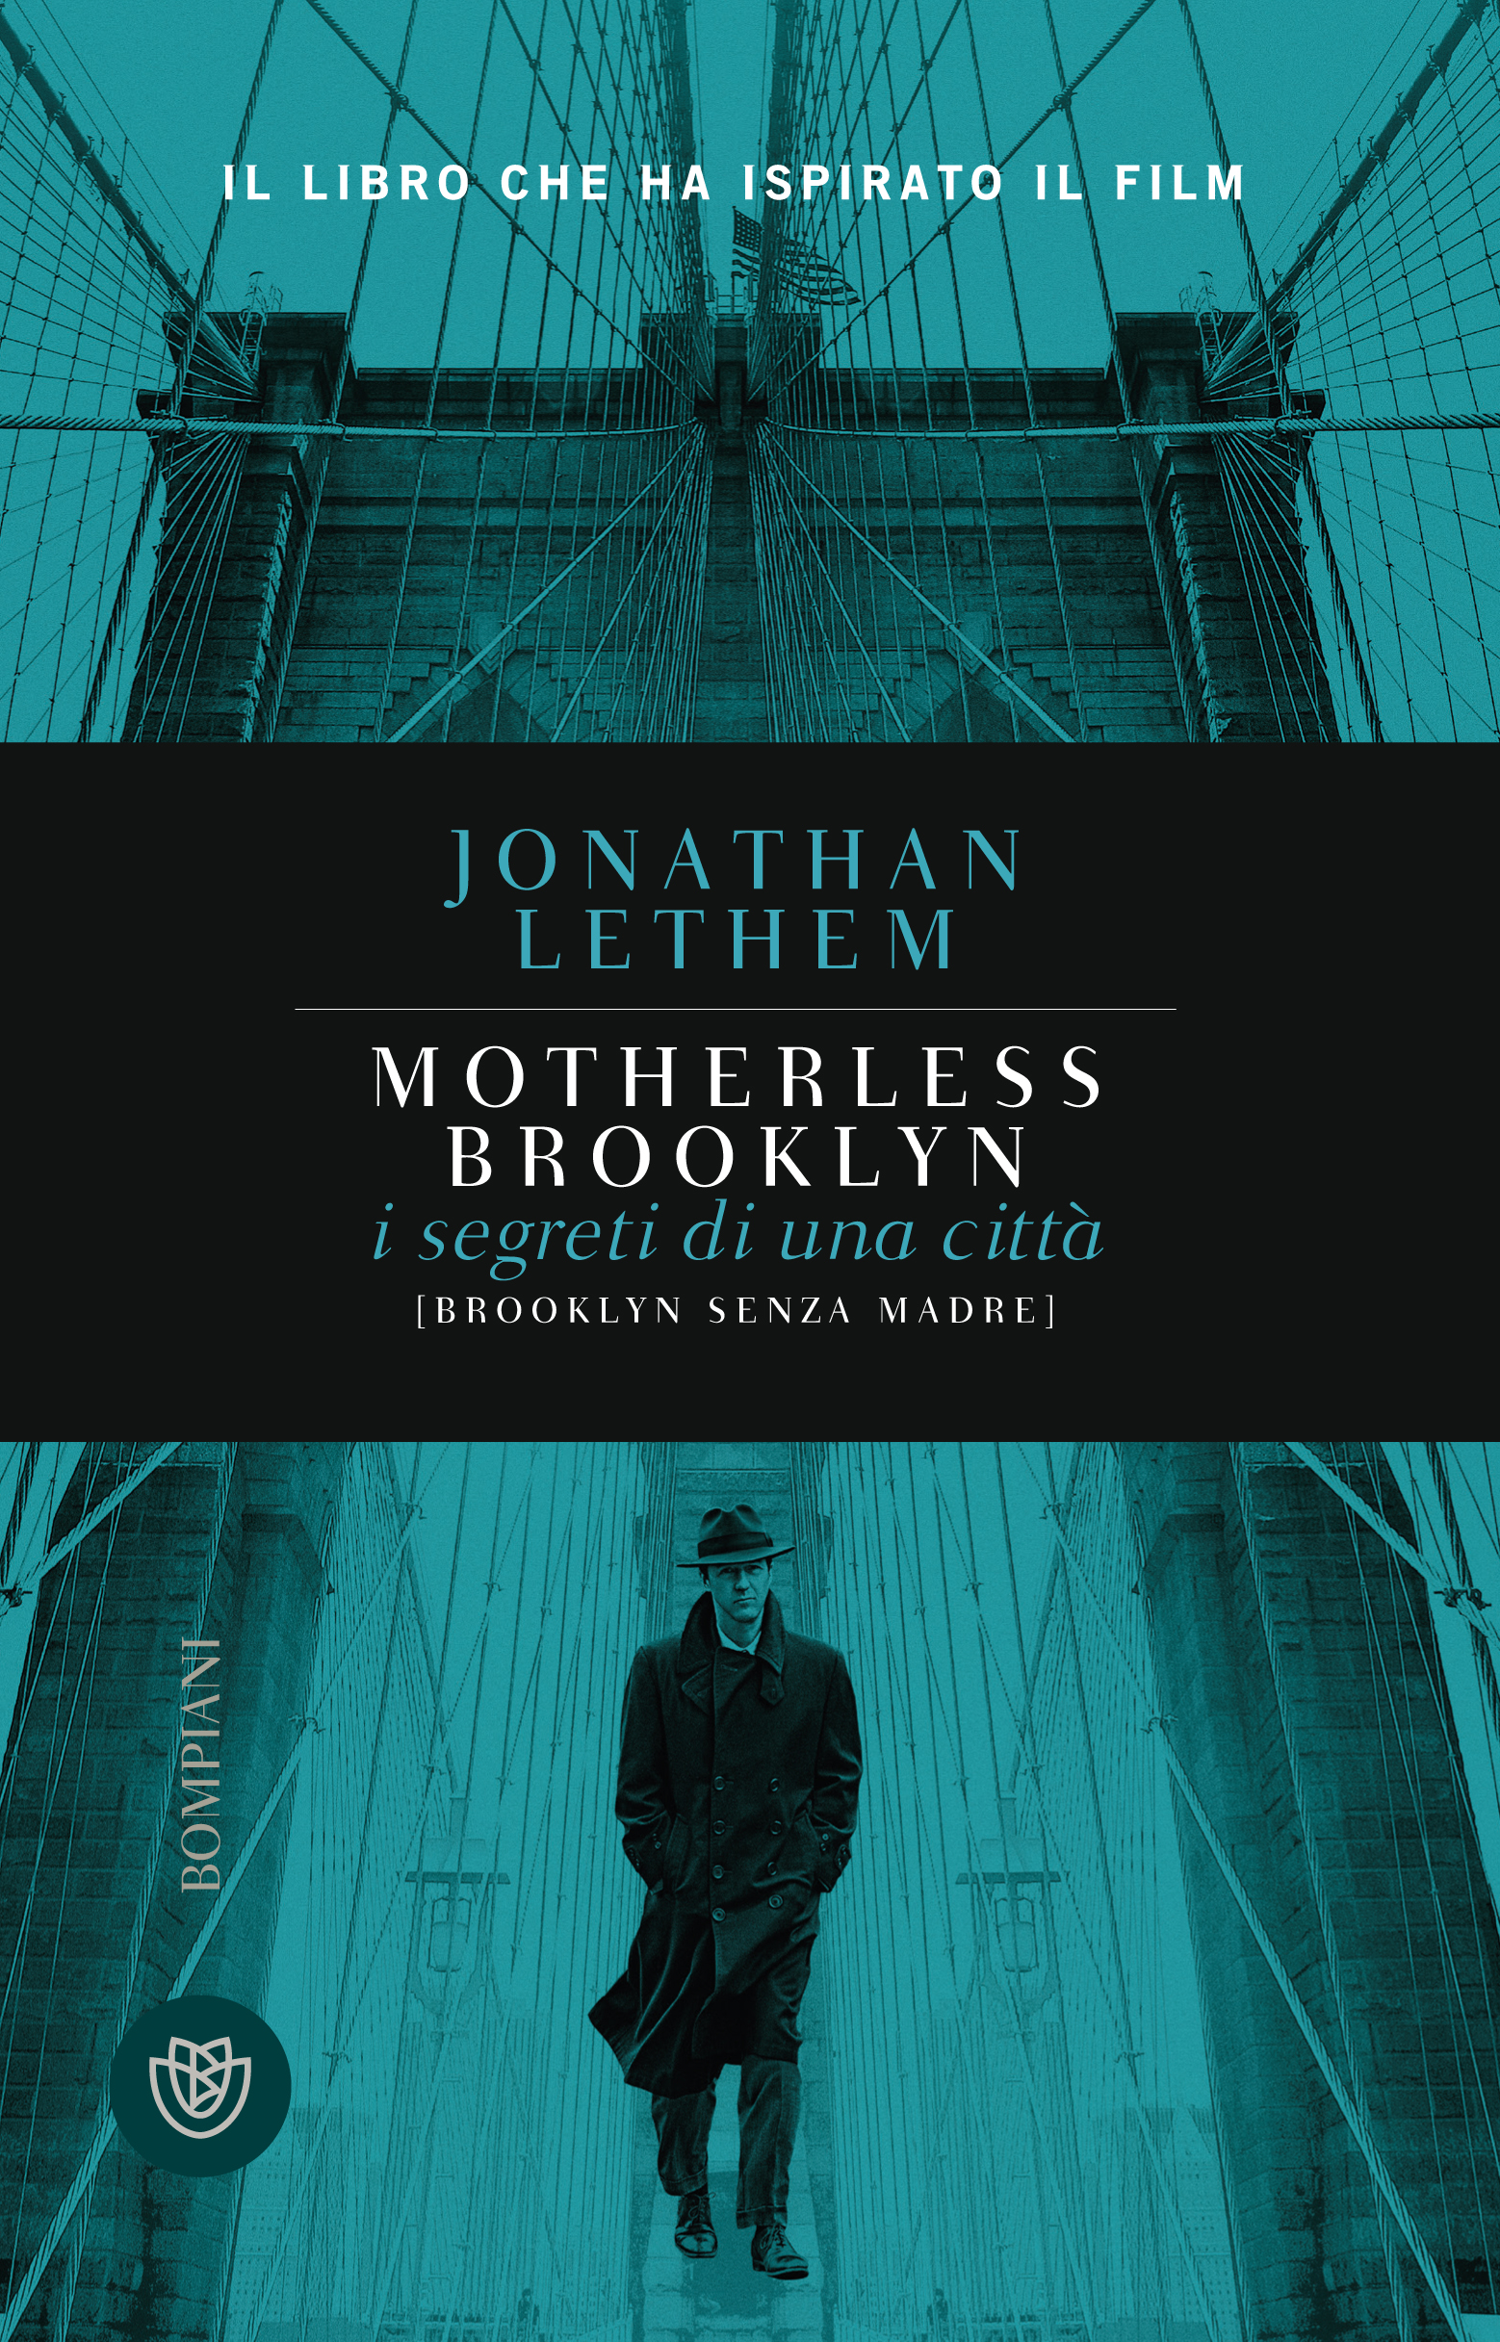 Brooklyn senza madre (Motherless Brooklyn)